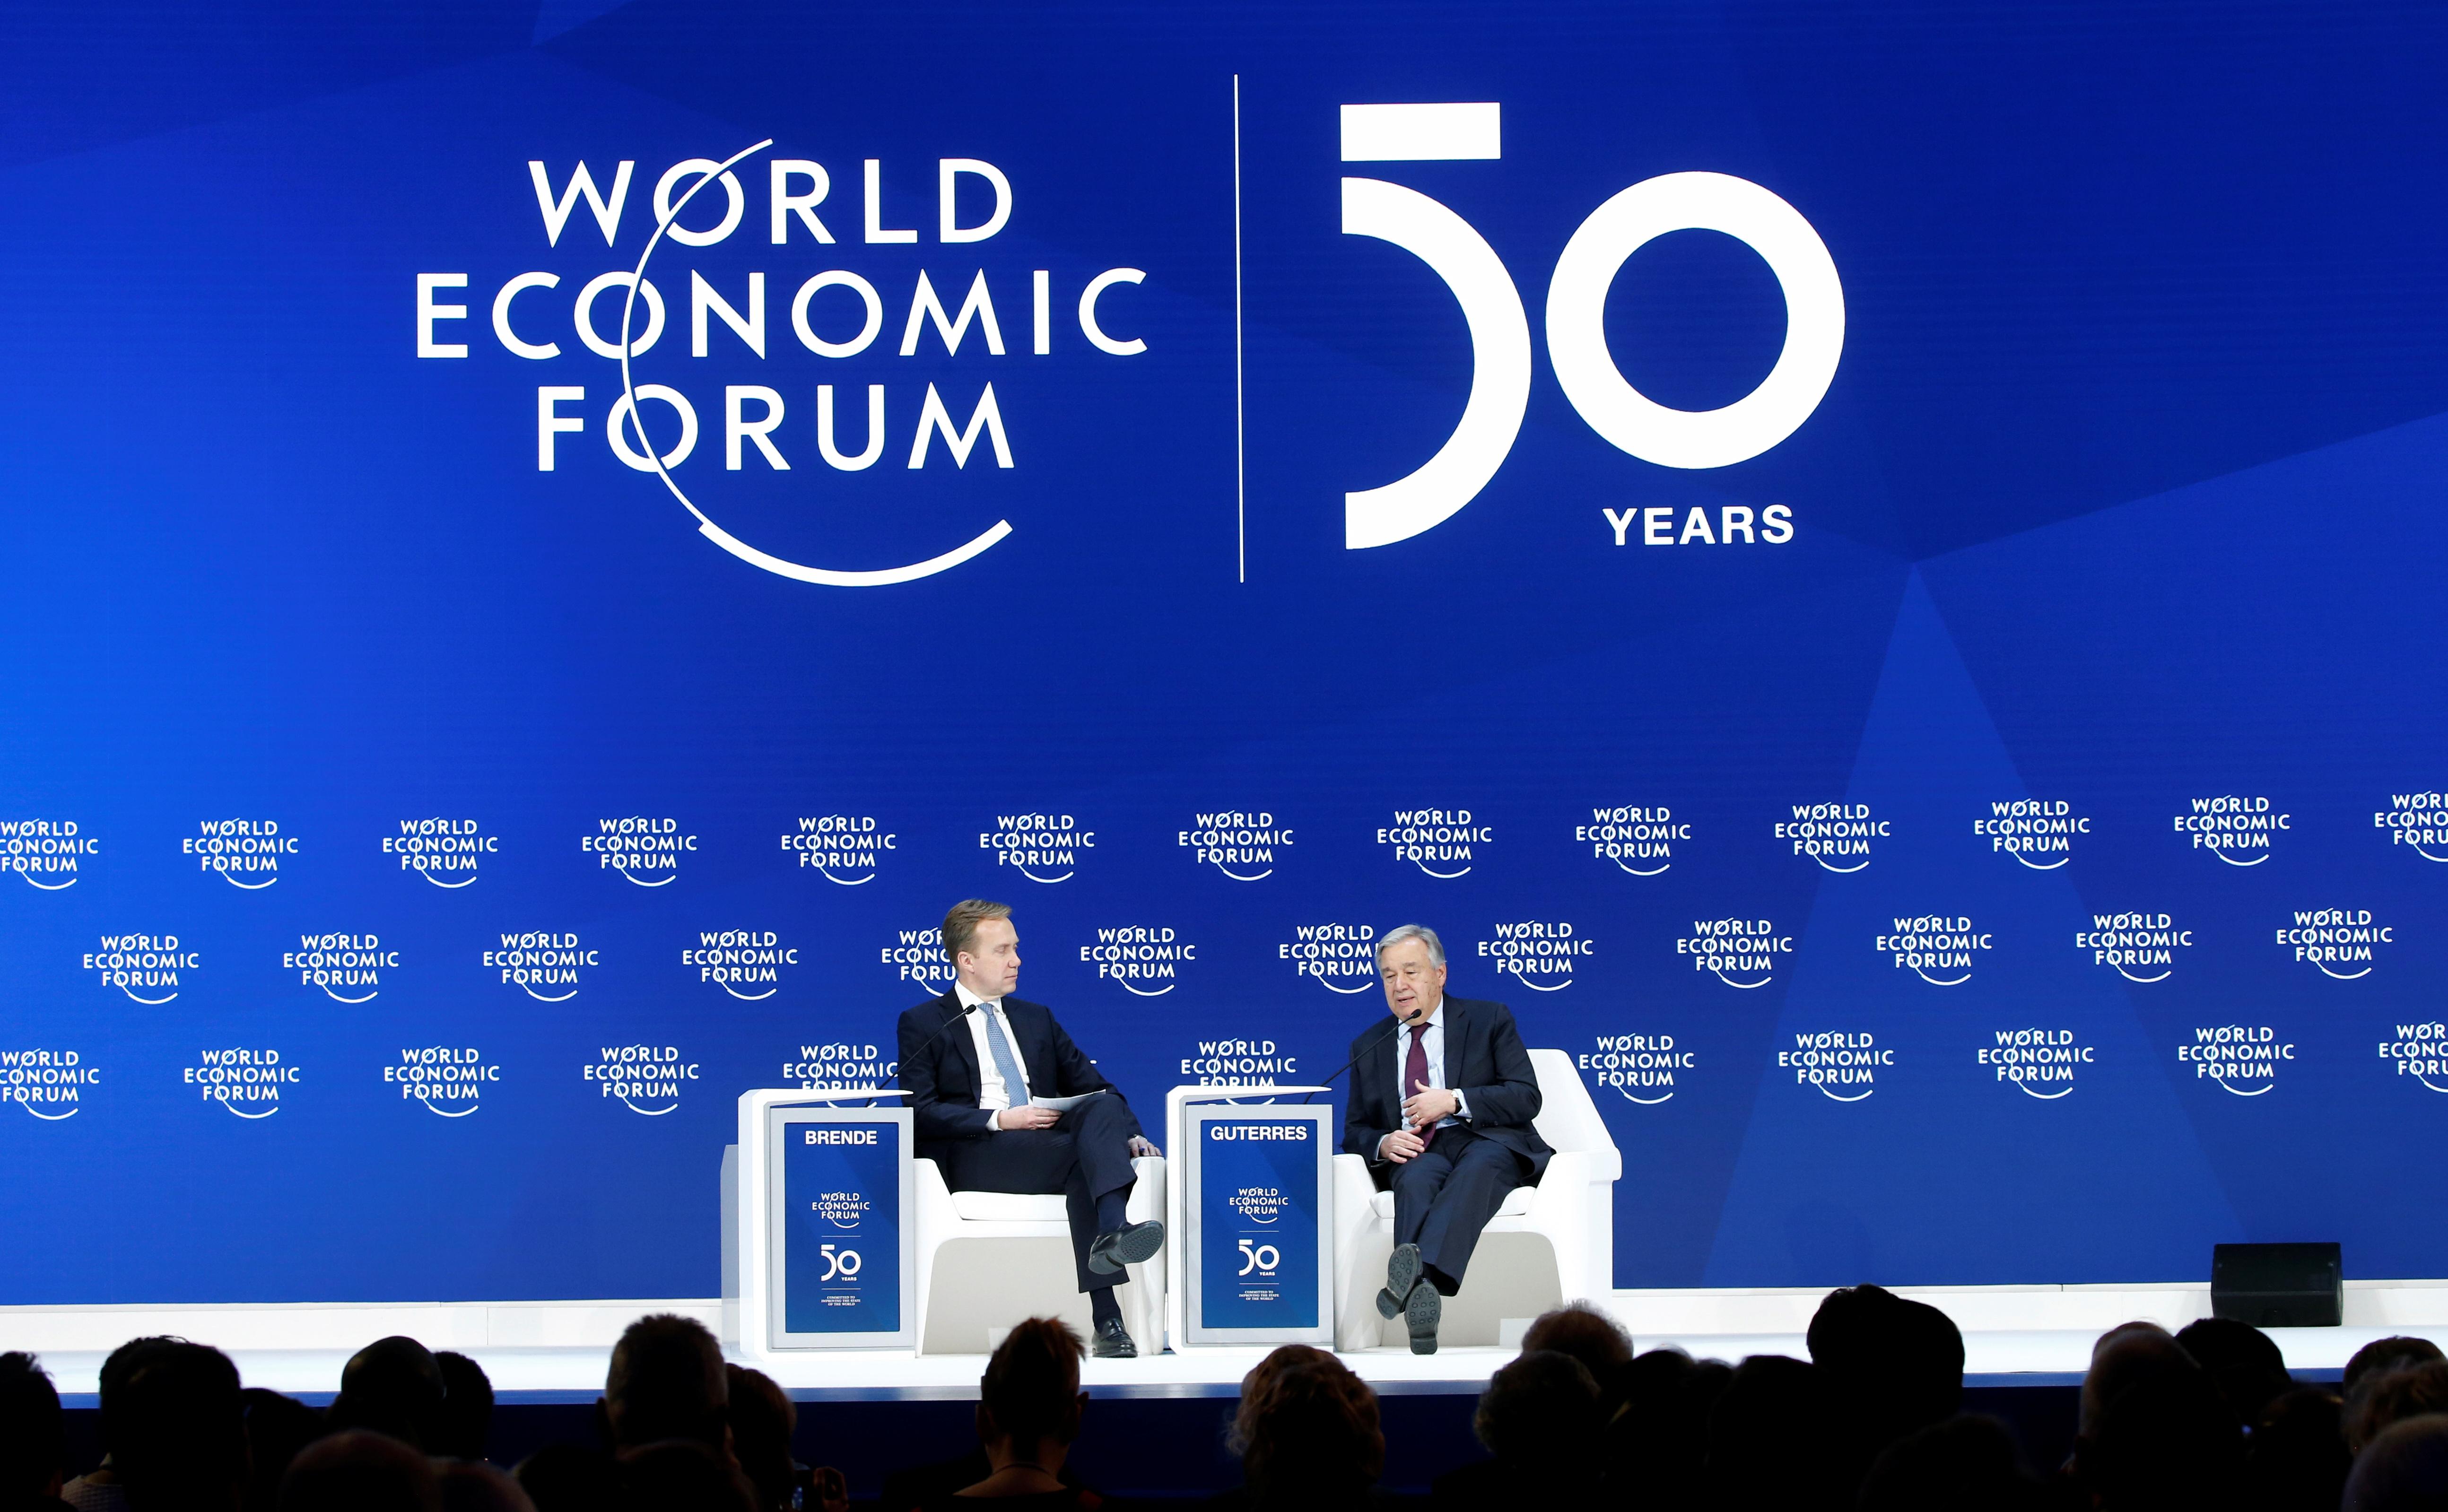 50th World Economic Forum (WEF) in Davos, Switzerland January 23, 2020,